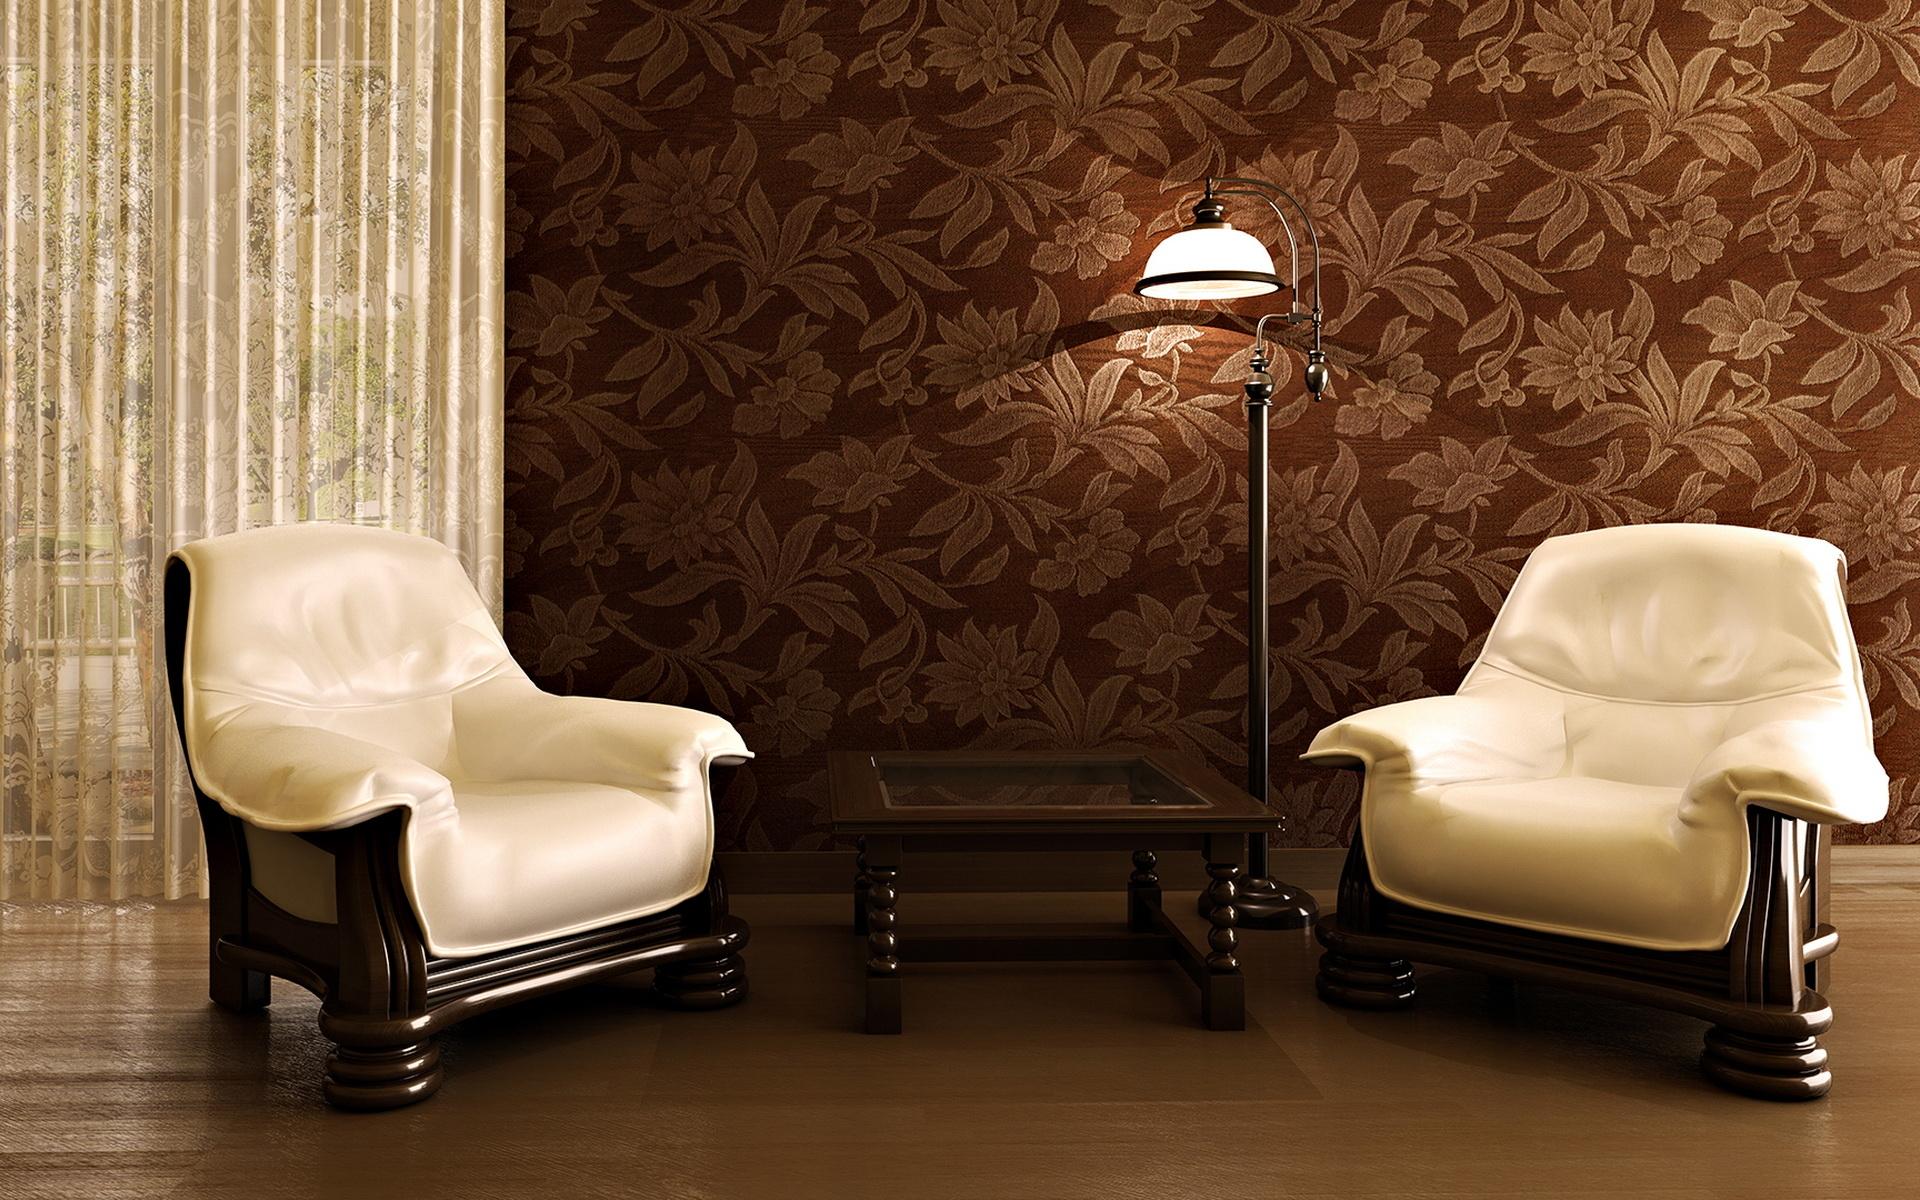 Texture Wall Design For Living Room - HD Wallpaper